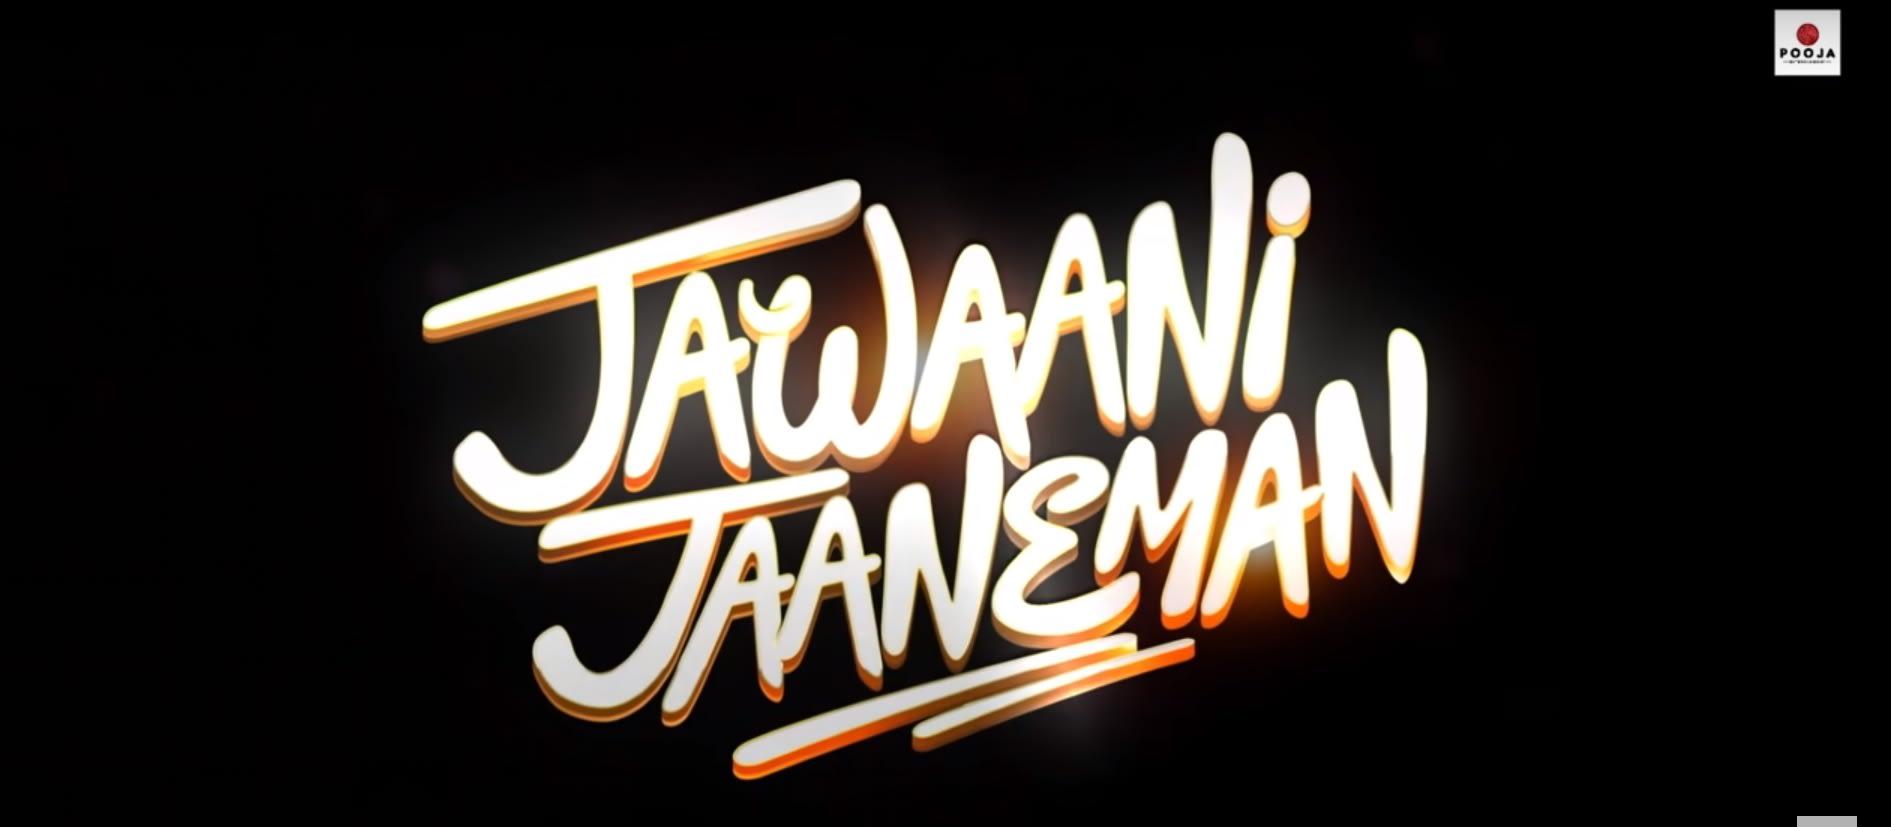 Jawaani Jaaneman full movie download in 720p 360p 480p.